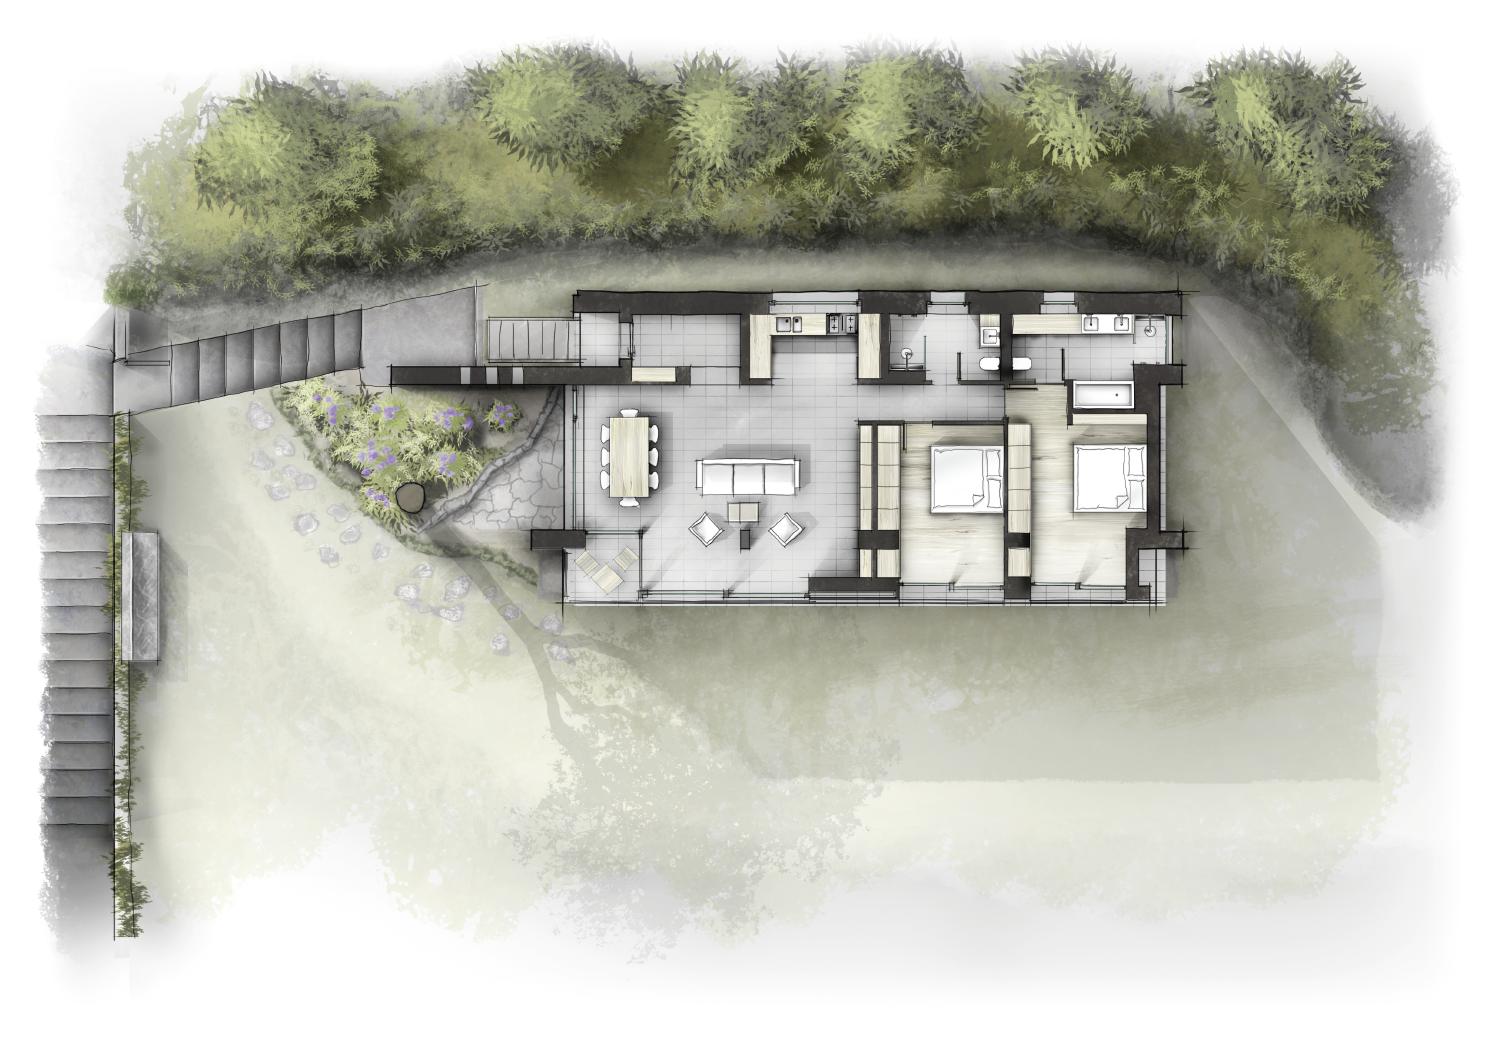 Innenarchitektur skizze grundriss  Villa Gardasee Grundriss OG | Innenarchitektur Zeichnungen Skizzen ...